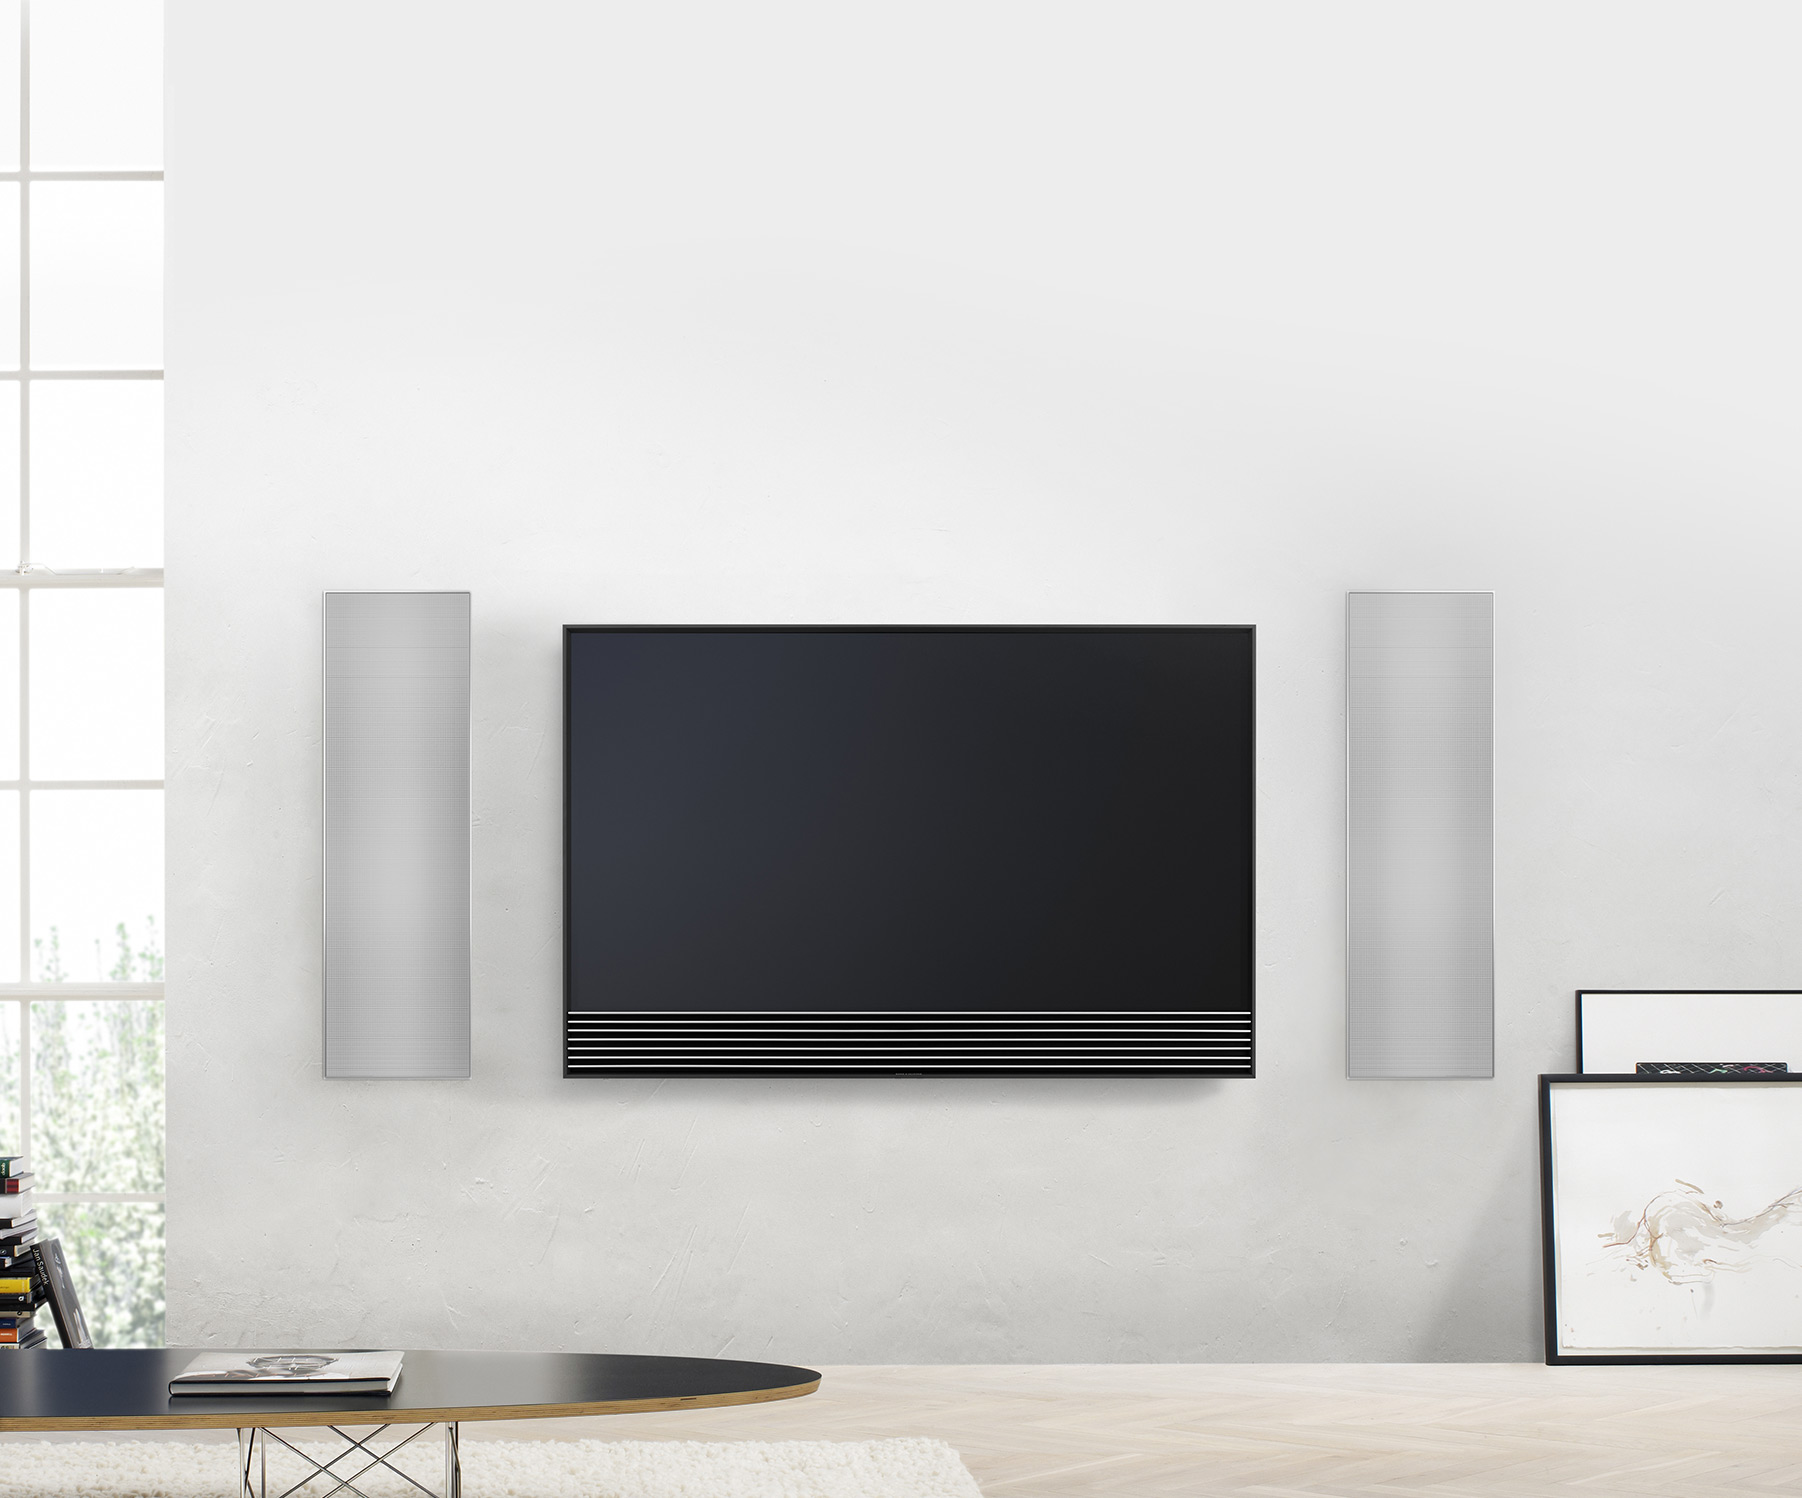 enceintes palatial. Black Bedroom Furniture Sets. Home Design Ideas